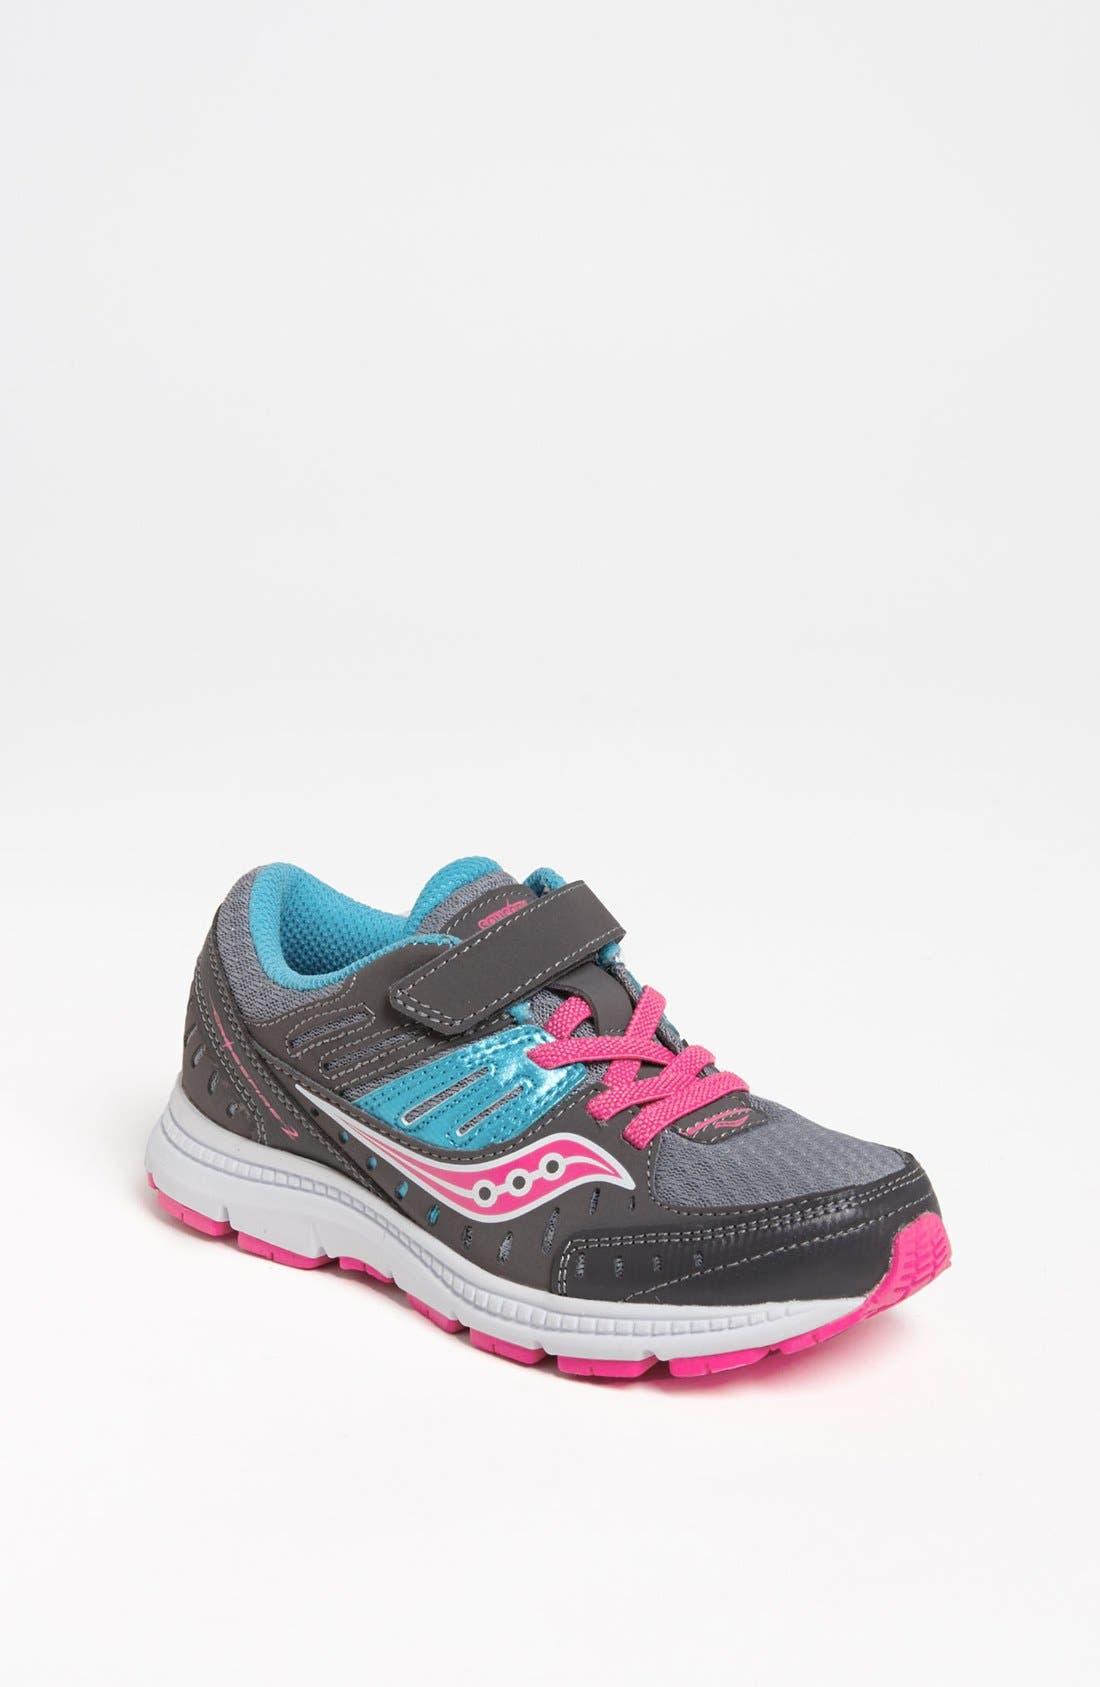 Alternate Image 1 Selected - Saucony 'Crossfire 2' Sneaker (Toddler & Little Kid)